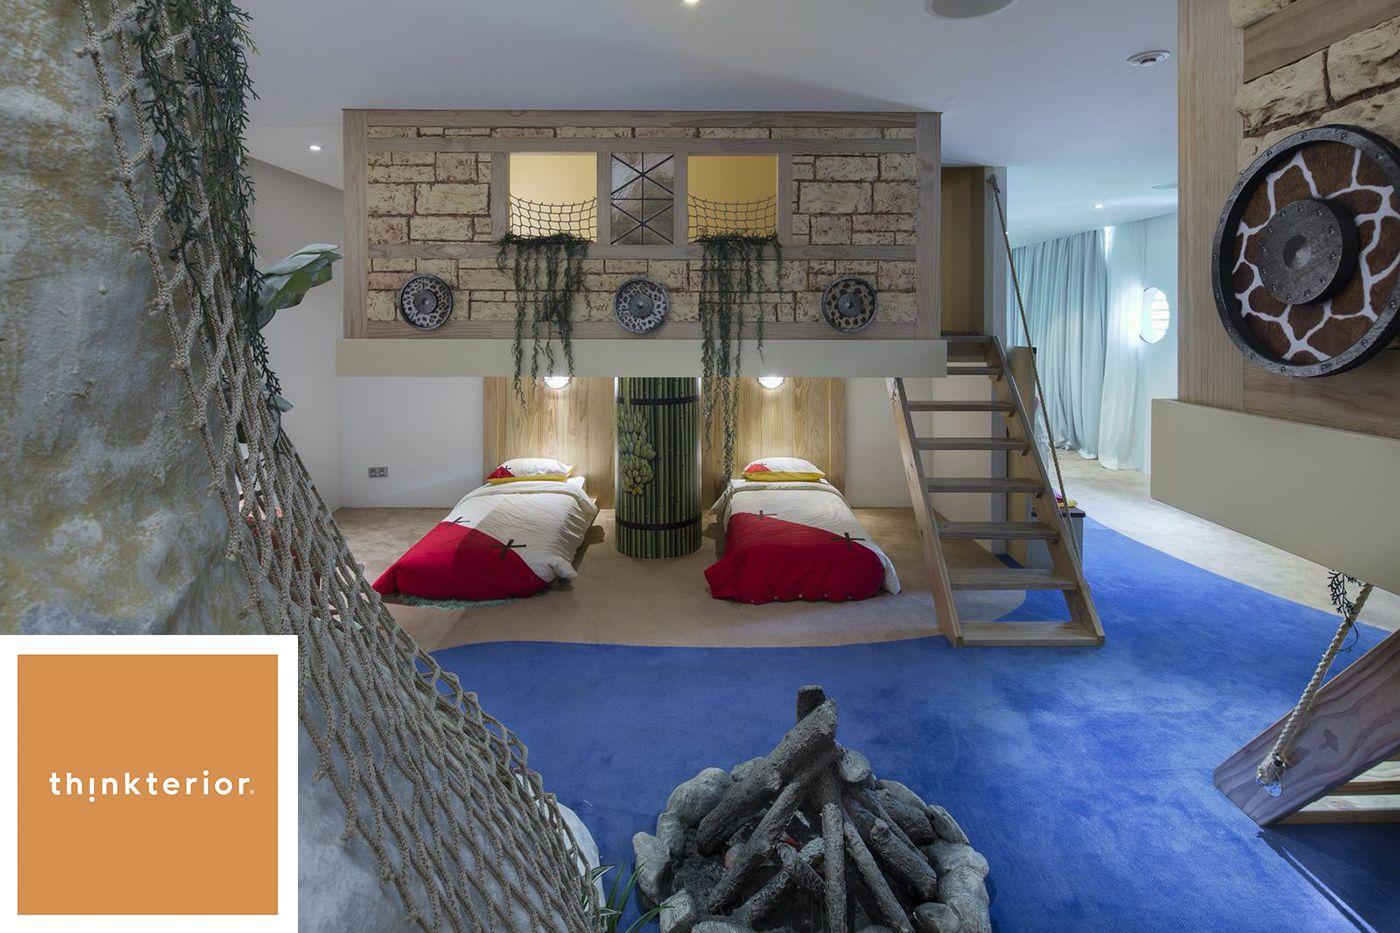 Interactive Bedroom Design Thinkterior Produces Custombespoke Children's Interiors Worldwide